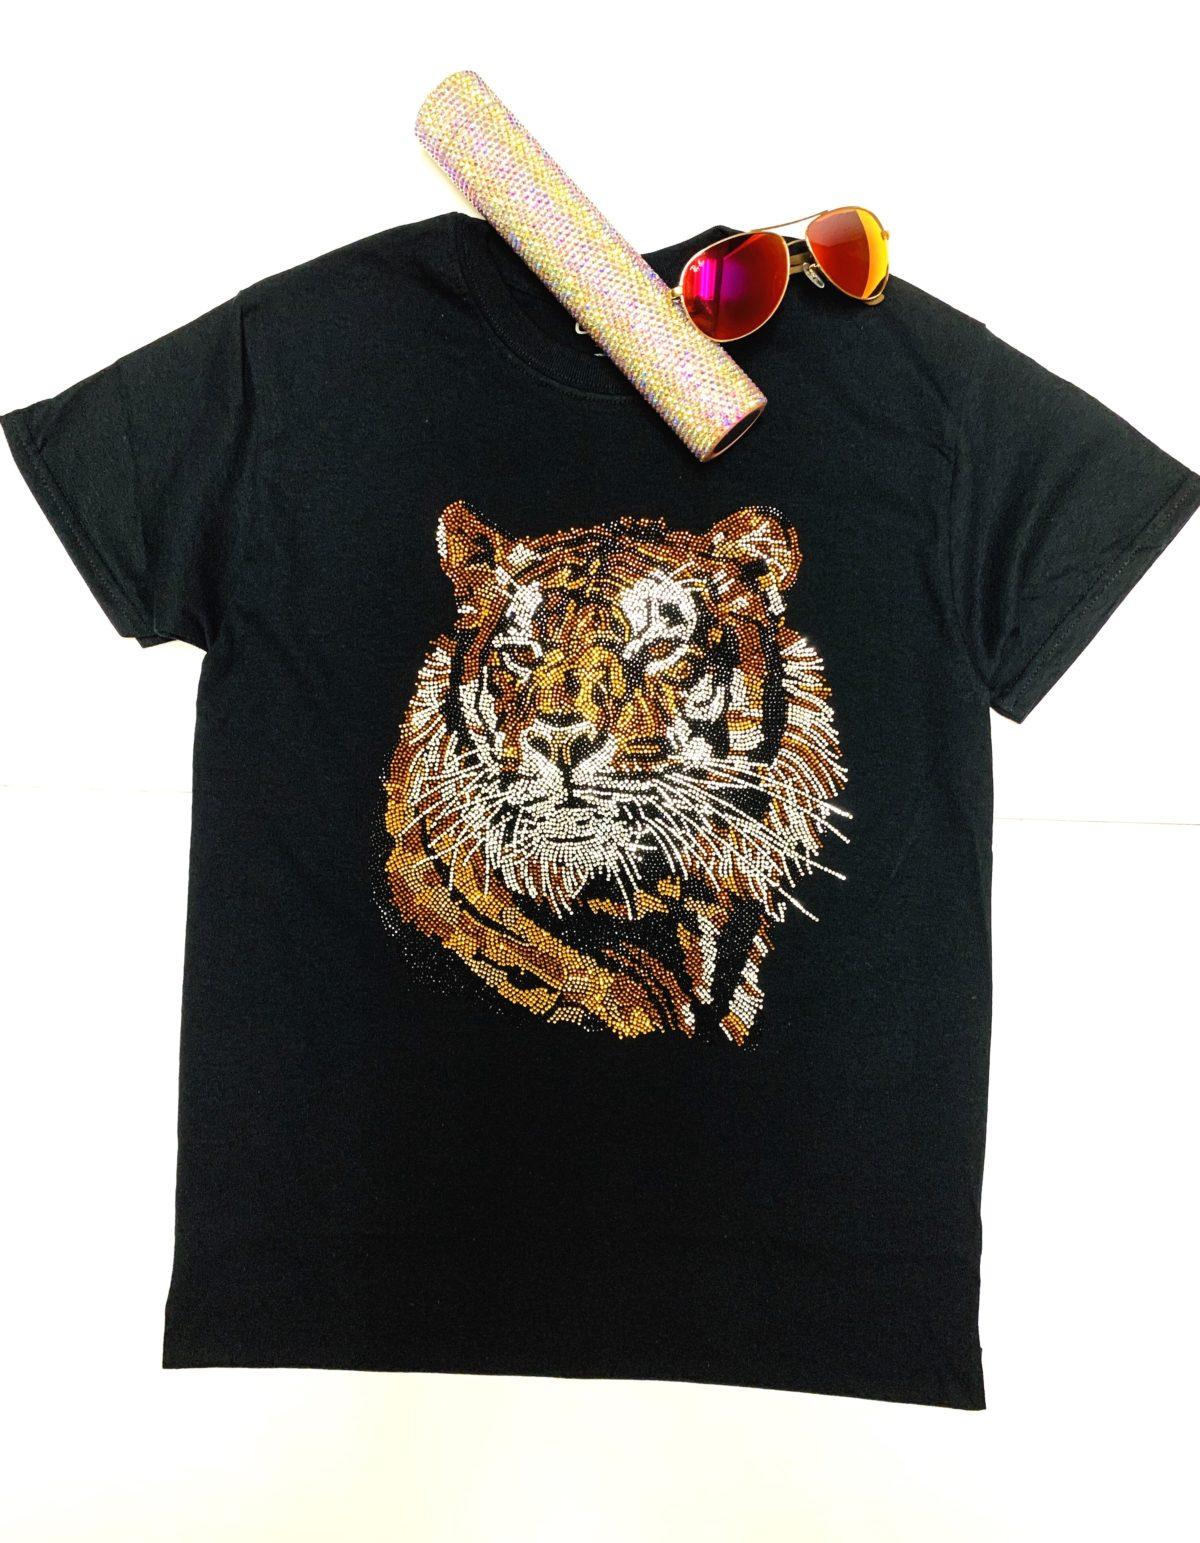 Tiger Bling Rhinestone Fashion T-shirt, Celebrity Inspired Shirts 1